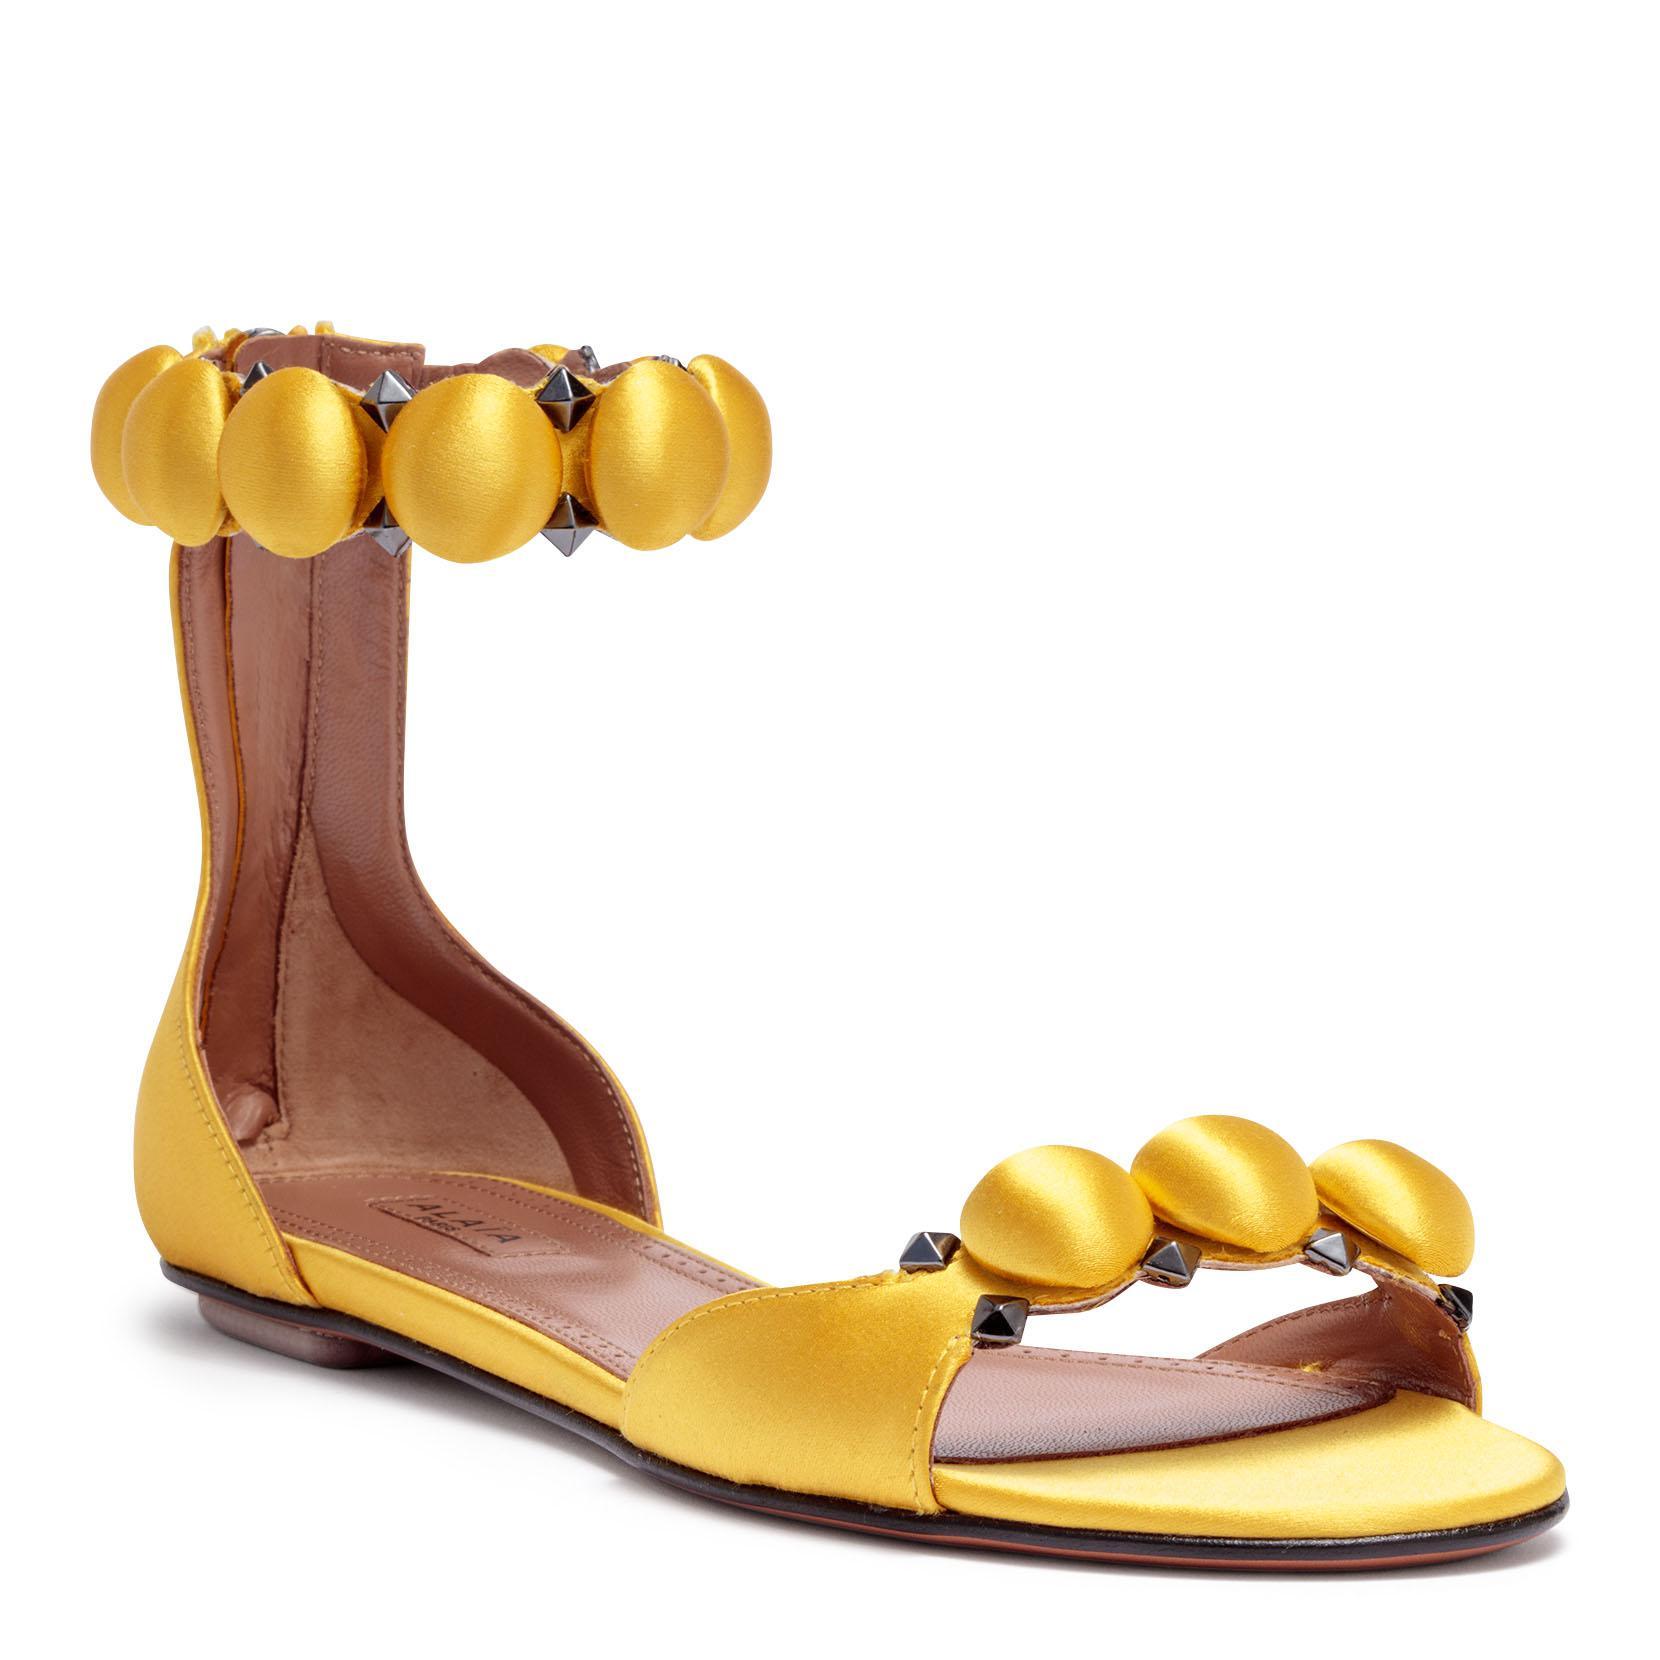 Exclusive Online Big Discount Cheap Price Yellow satin bomb flat sandals Alaia W359vKWFv3